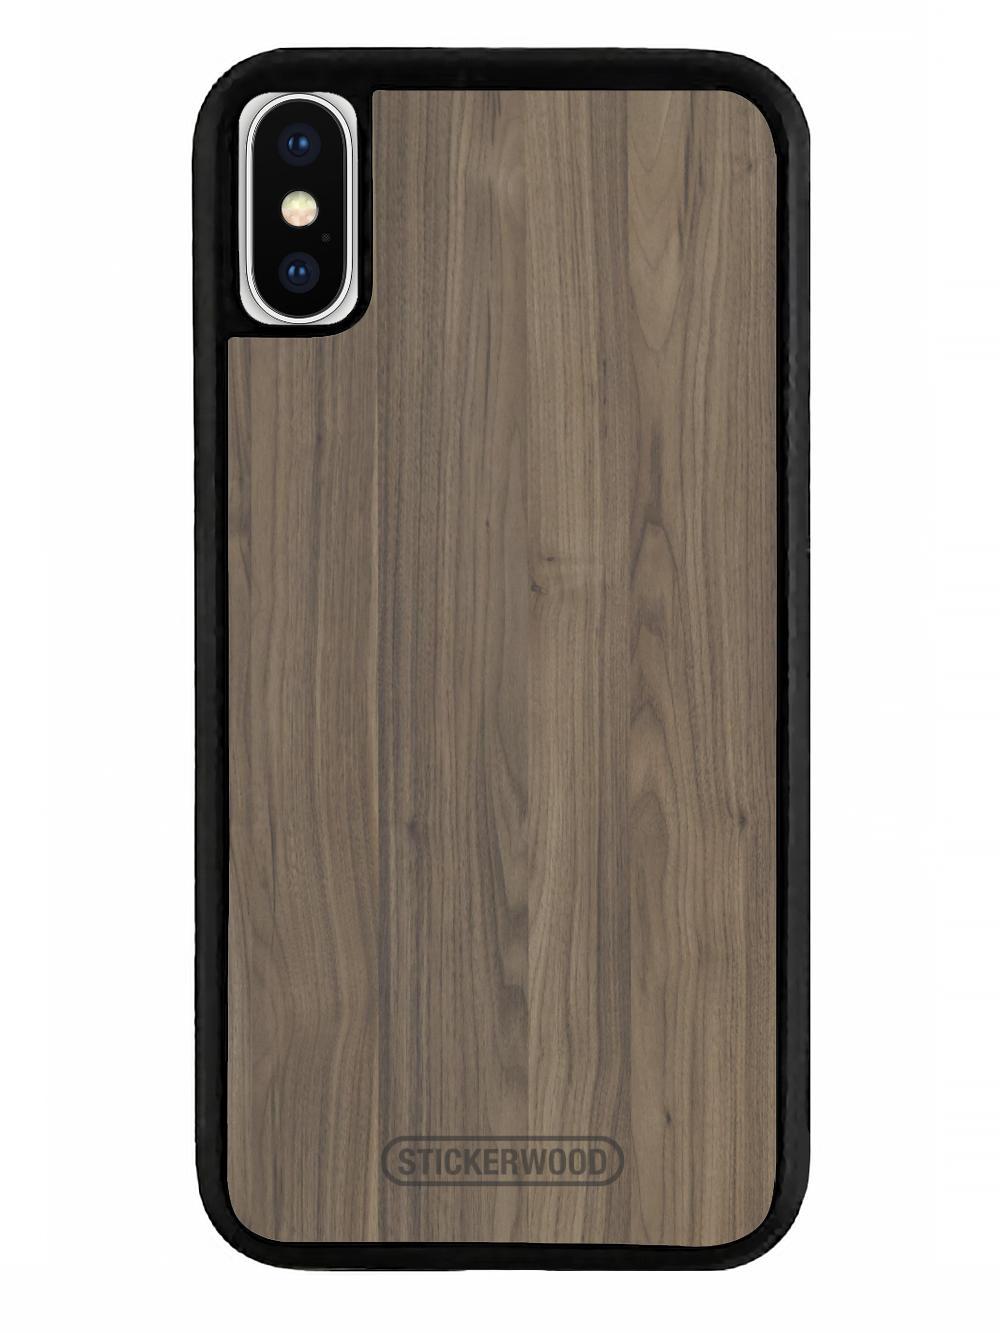 Stickerwood Wallnut